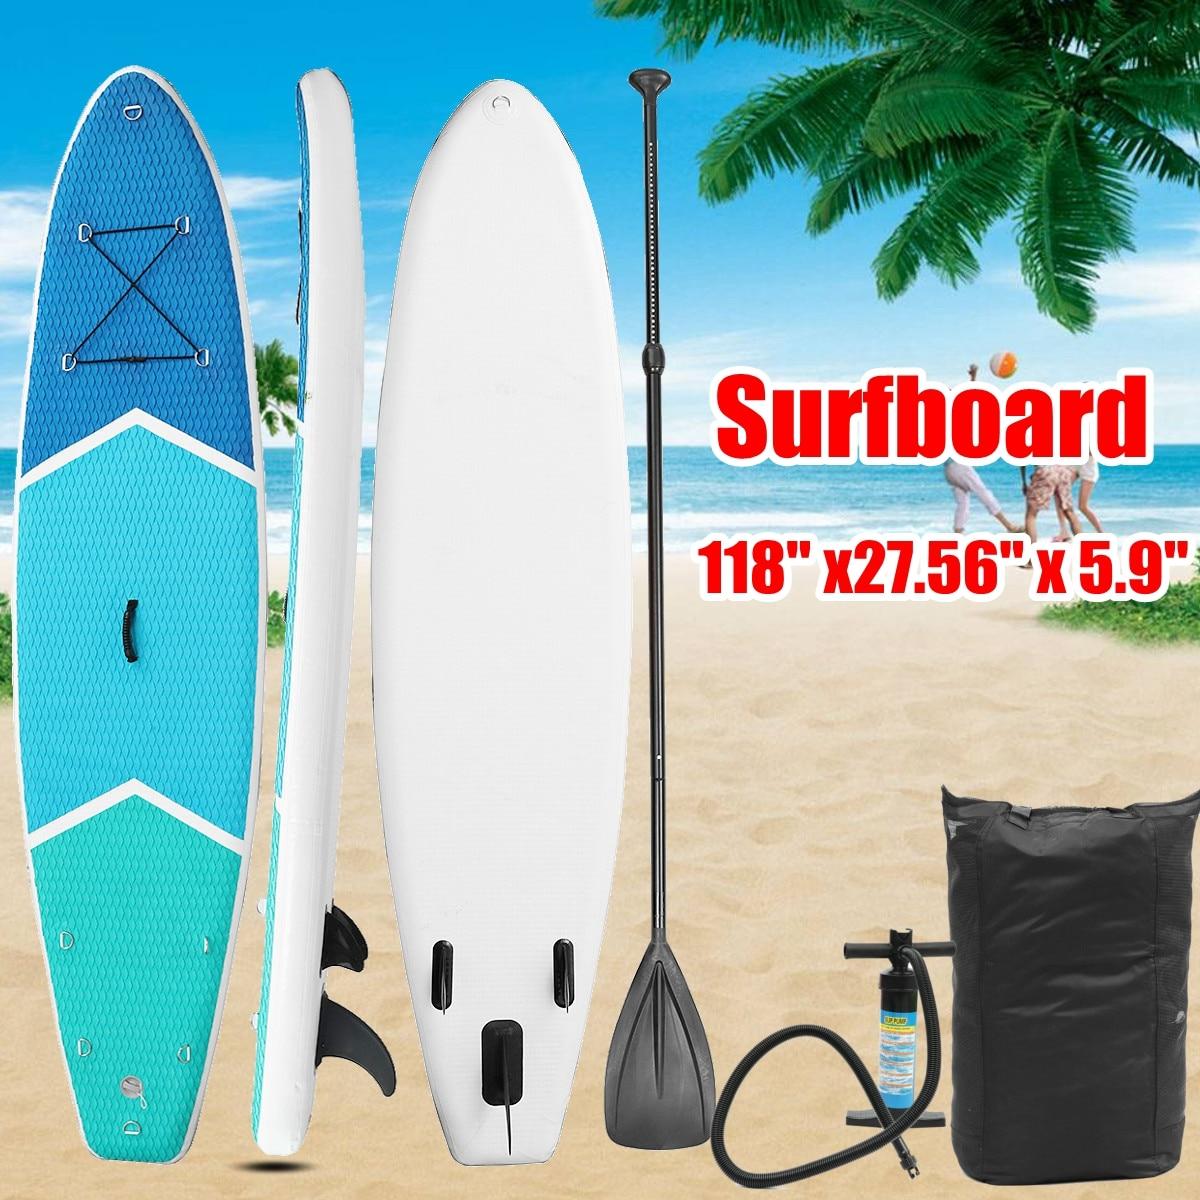 300*70*15 cm tavola da surf gonfiabile Stand Up Bordo SUP Brett Surf aufblasbar paddle barca mit materiale di Riparazione + Paddel